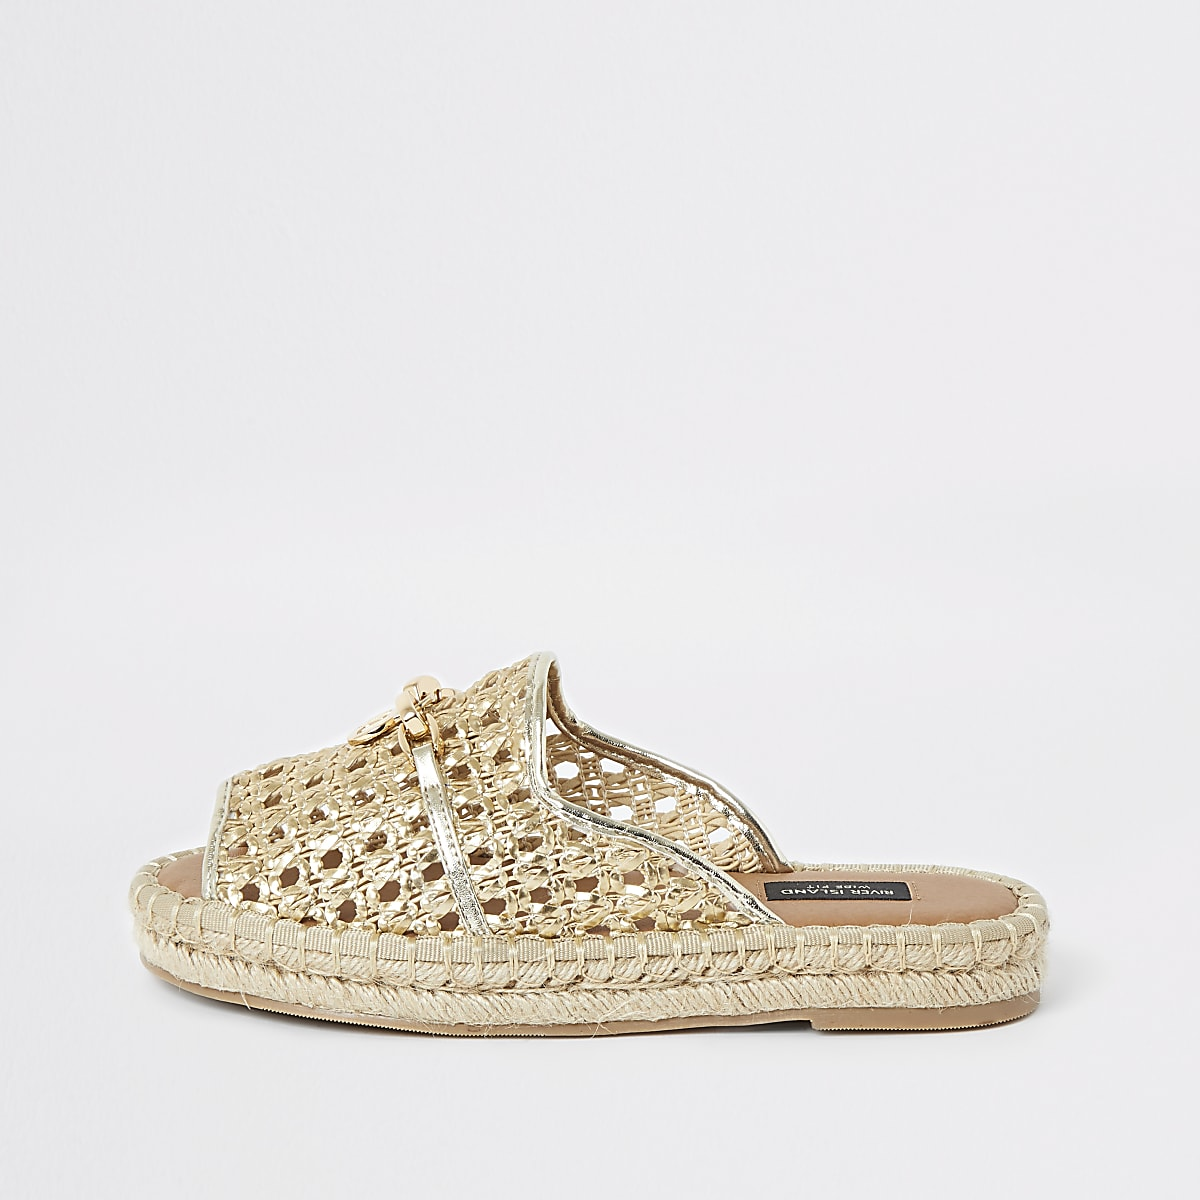 Gold espadrille peep toe wide fit sandals